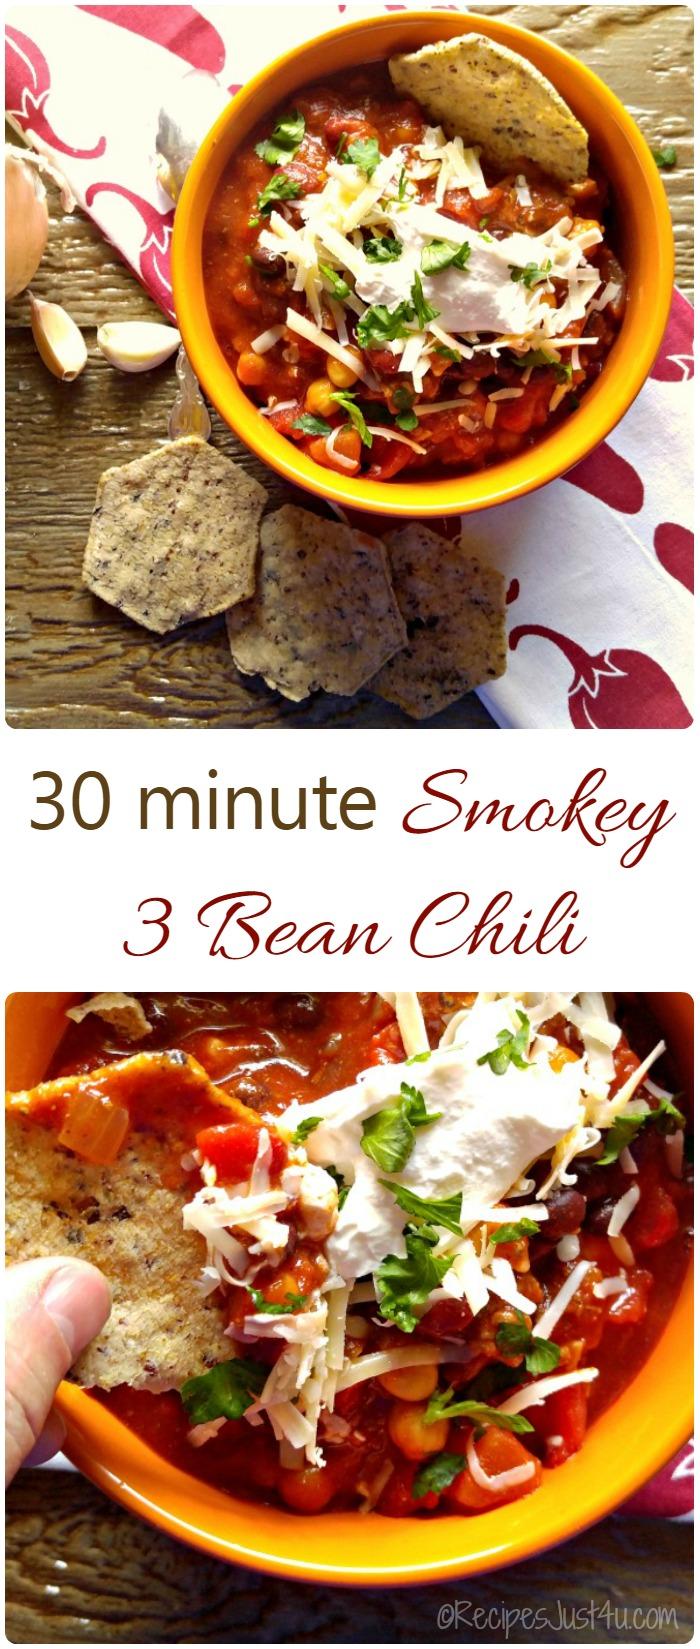 Smokey 3 Bean Chili - Ready in 30 minutes